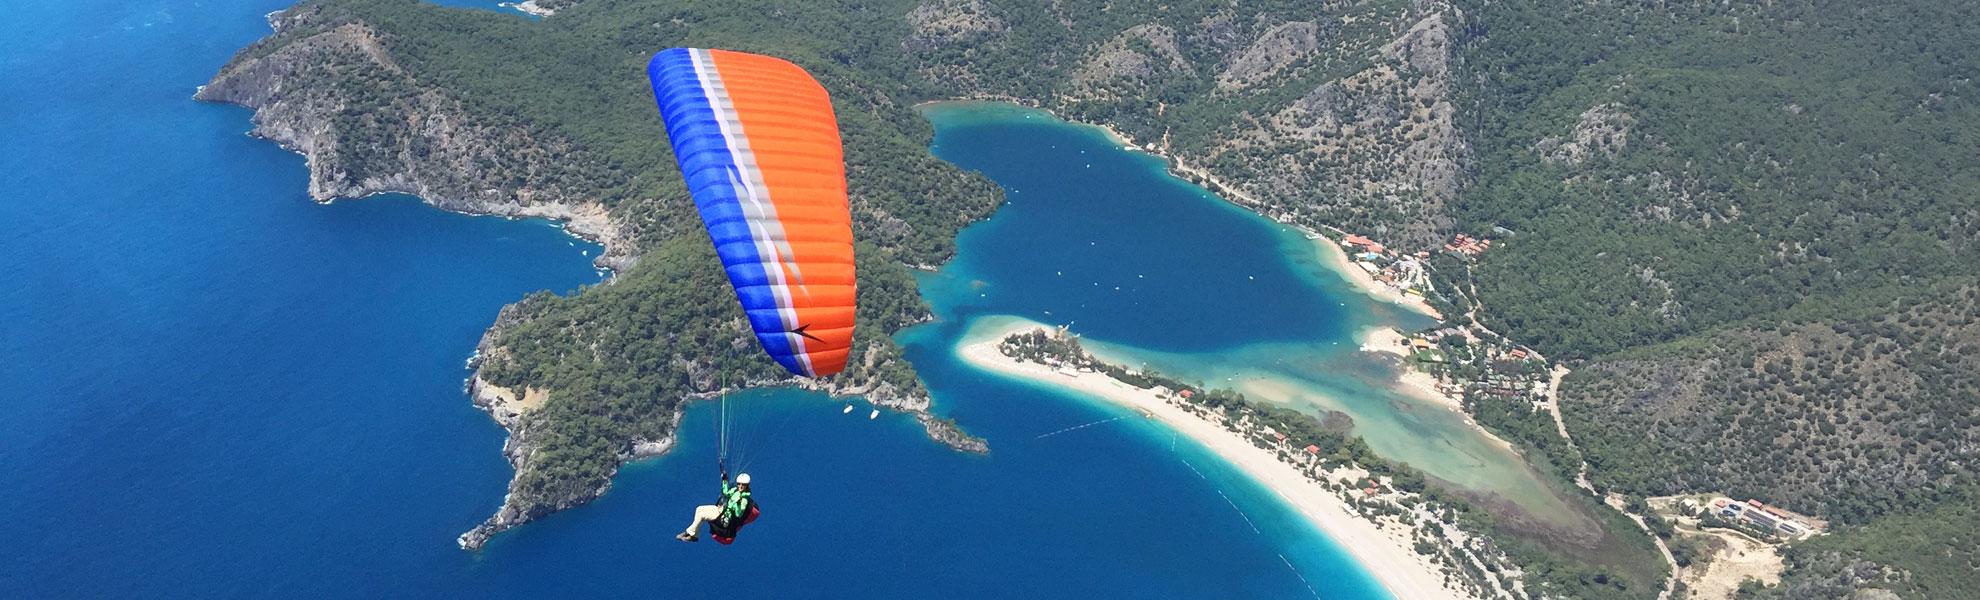 Turkije-paragliding